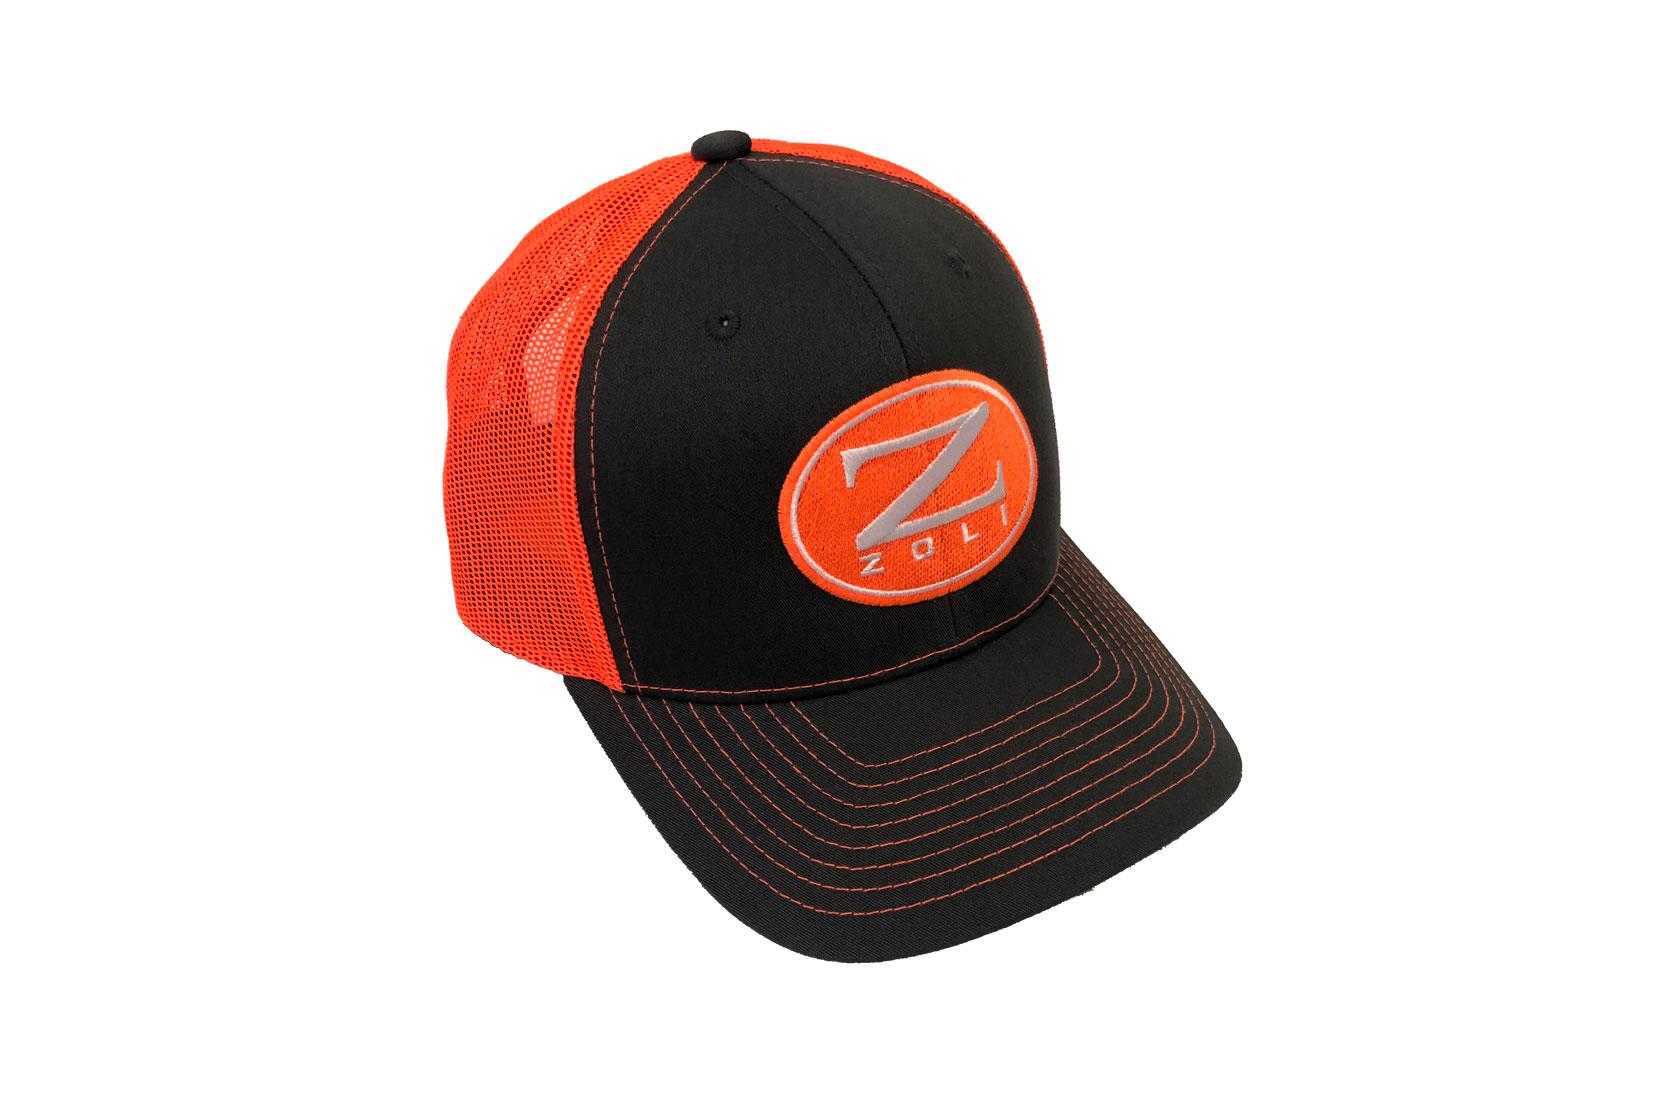 Zoli Embroidered Snap Back Hat (Orange)